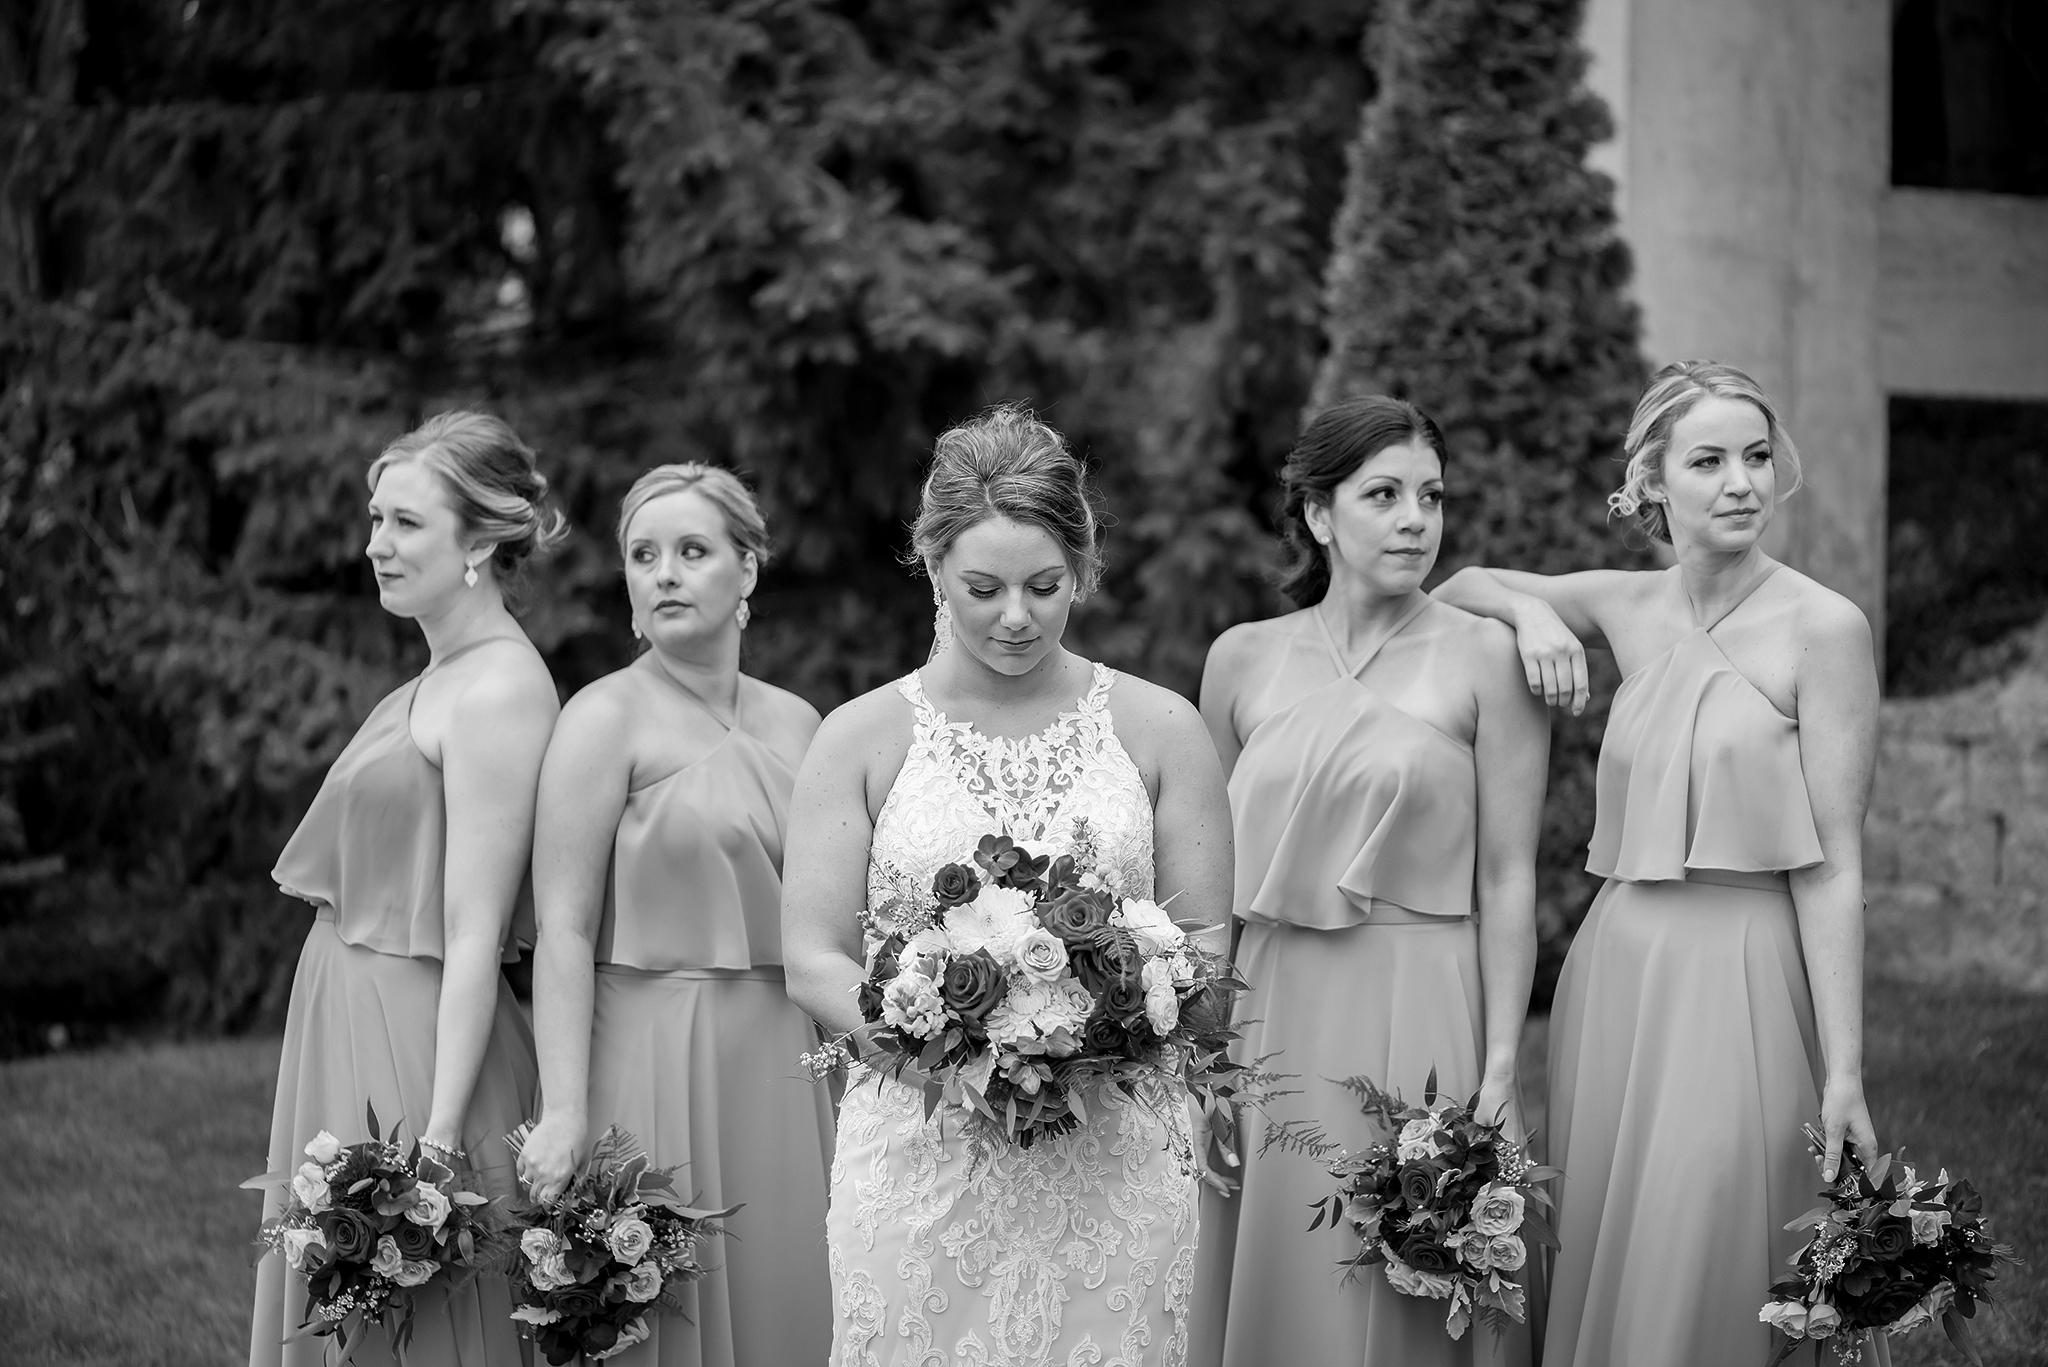 LINDSAY-ADKINS-PHOTOGRAPHY-MICHIGAN-WEDDING-PHOTOGRAPHER-FRANKENMUTH-BREWERY-WEDDING-MICHIGAN-BLOG-17